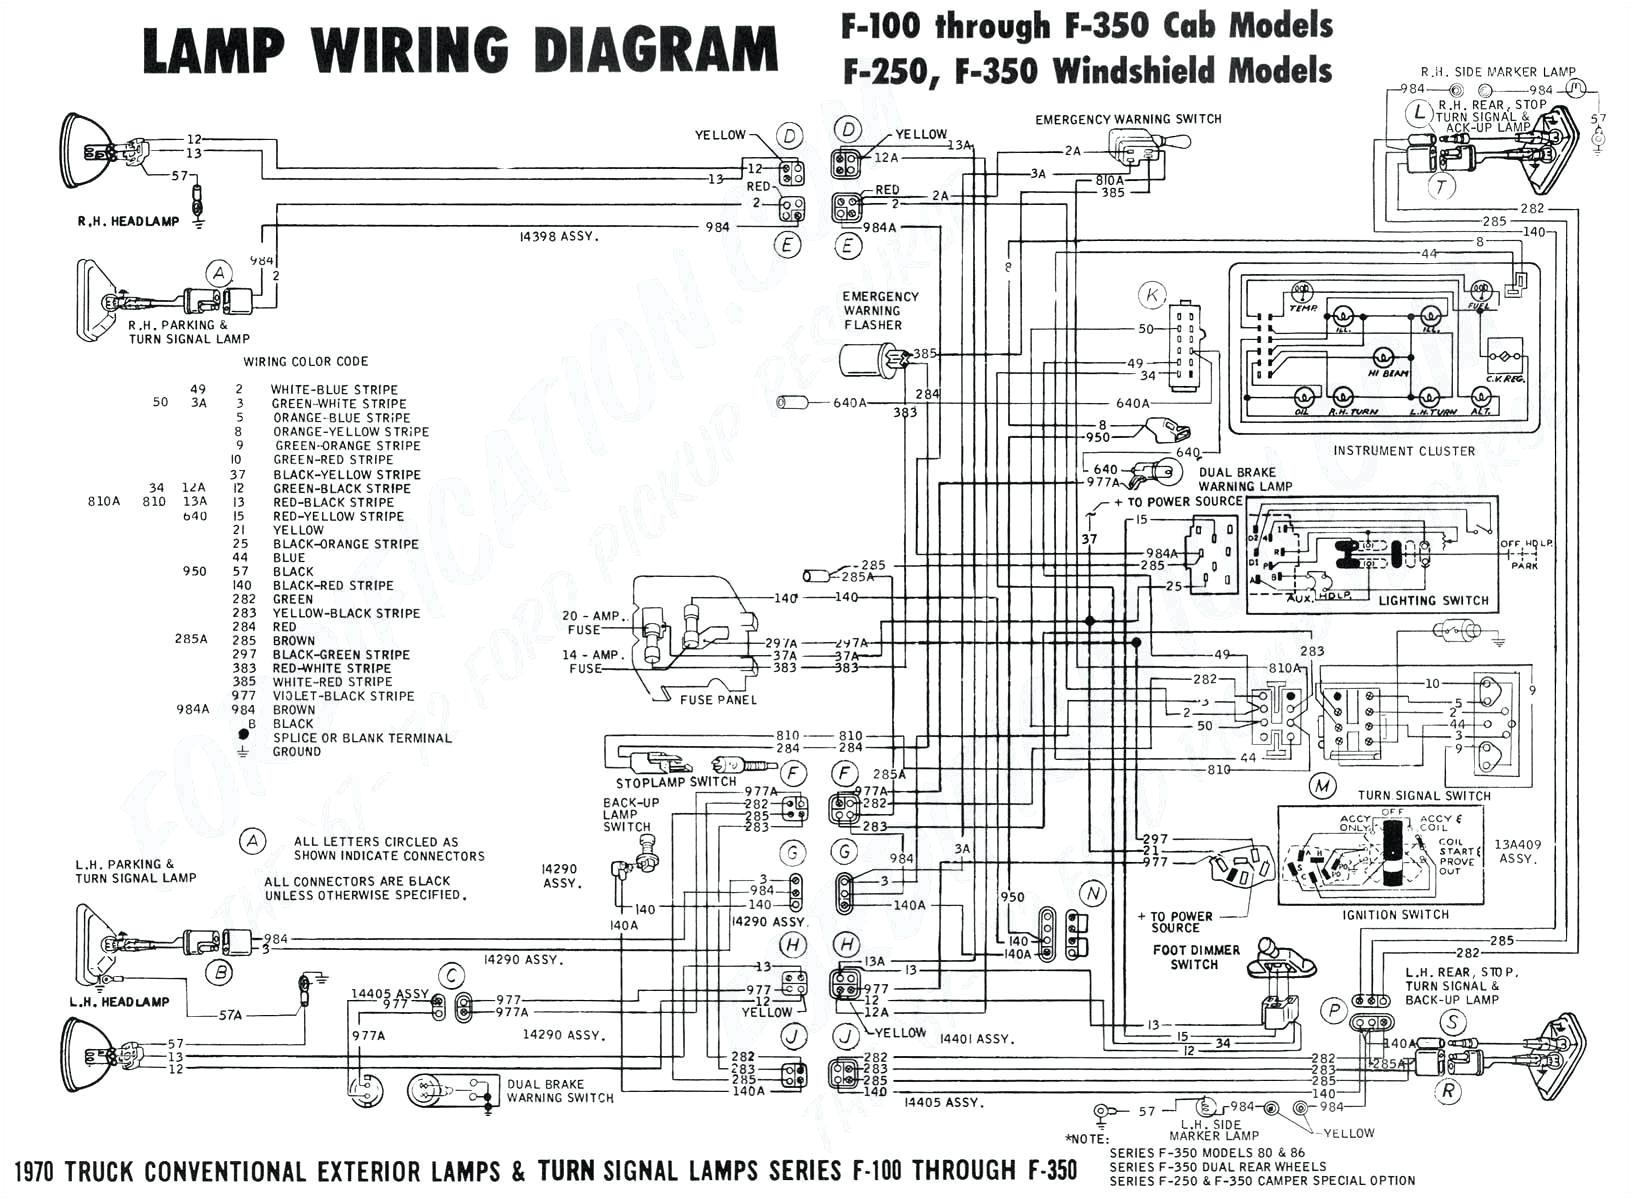 3 phase water heater wiring diagram free download wiring diagrams 3 phase water heater wiring diagram free download